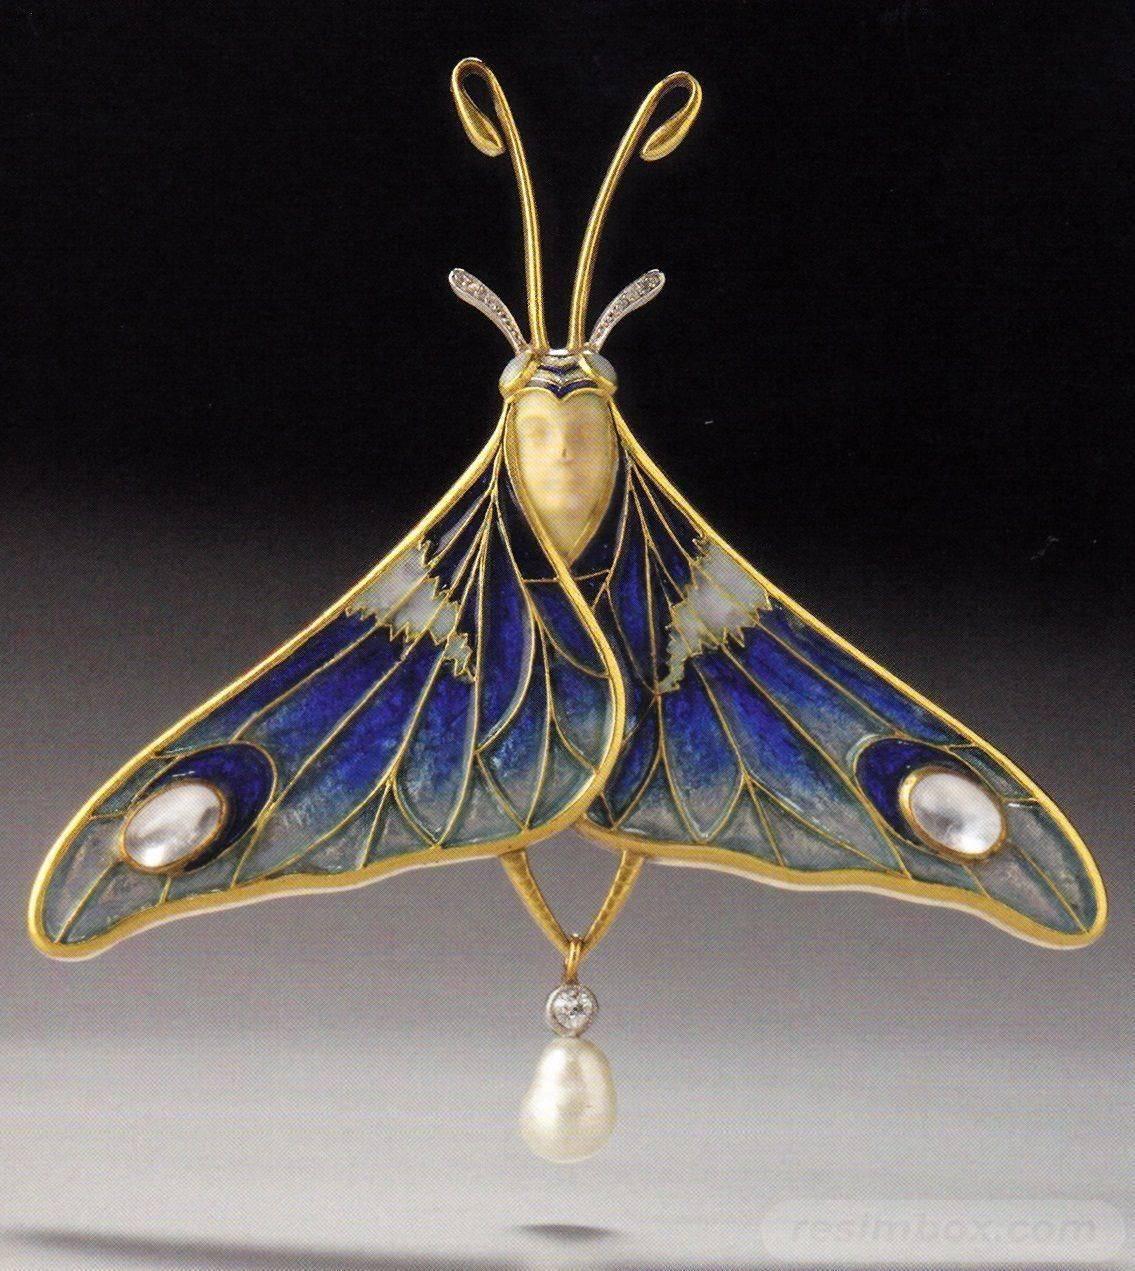 Art deco jewelry-621848661028259410